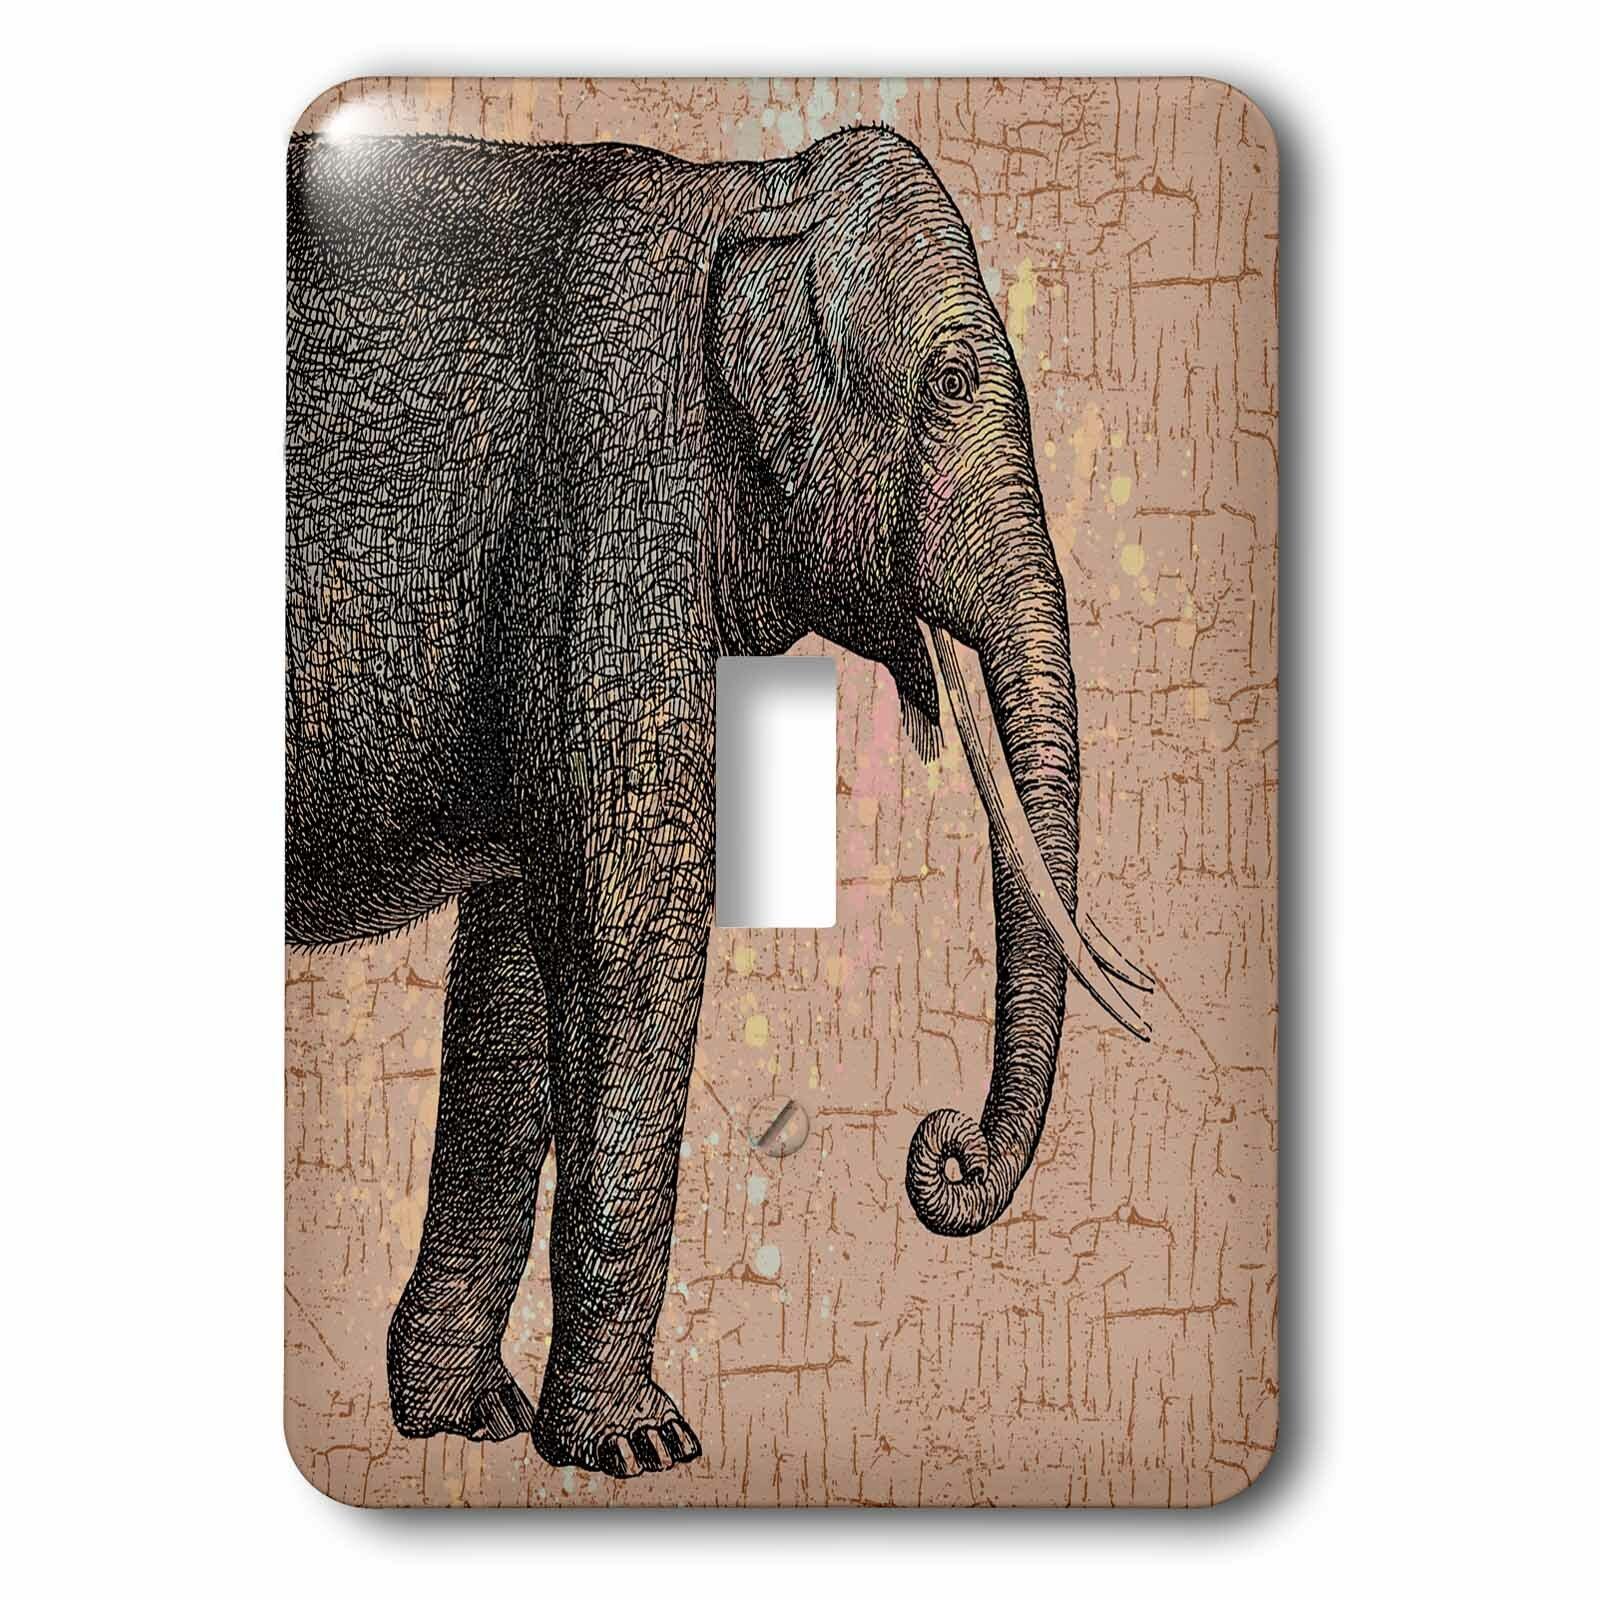 3drose Elephant 1 Gang Toggle Light Switch Wall Plate Wayfair